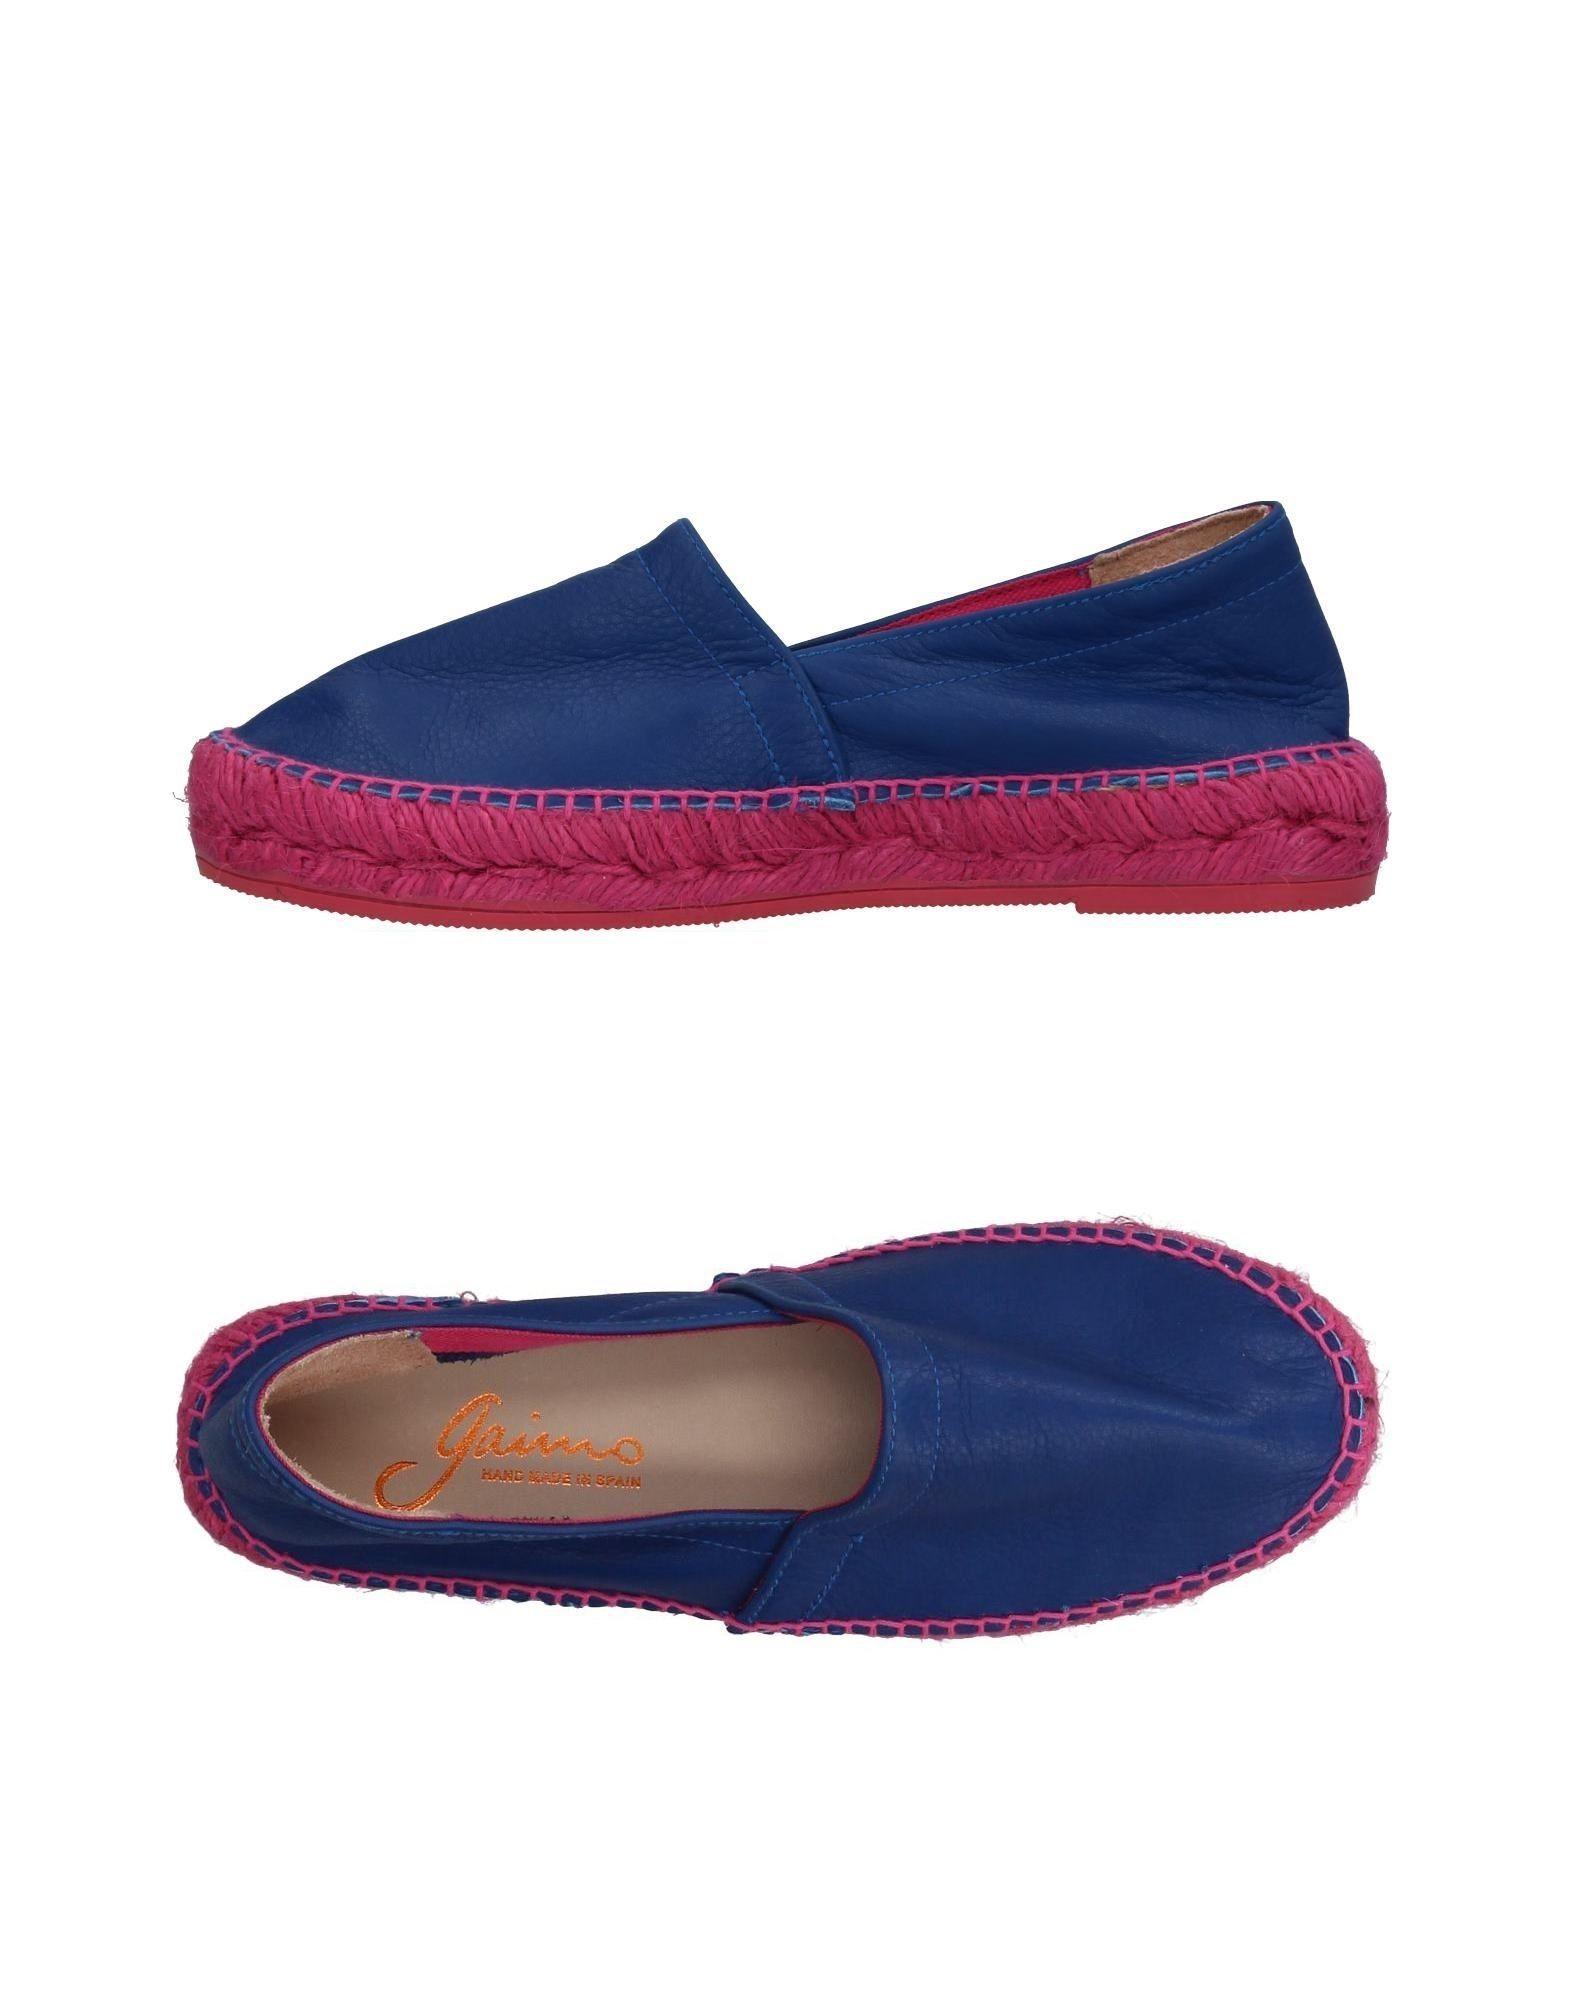 Gaimo Espadrilles Damen    11380870PX Heiße Schuhe 3cc96f